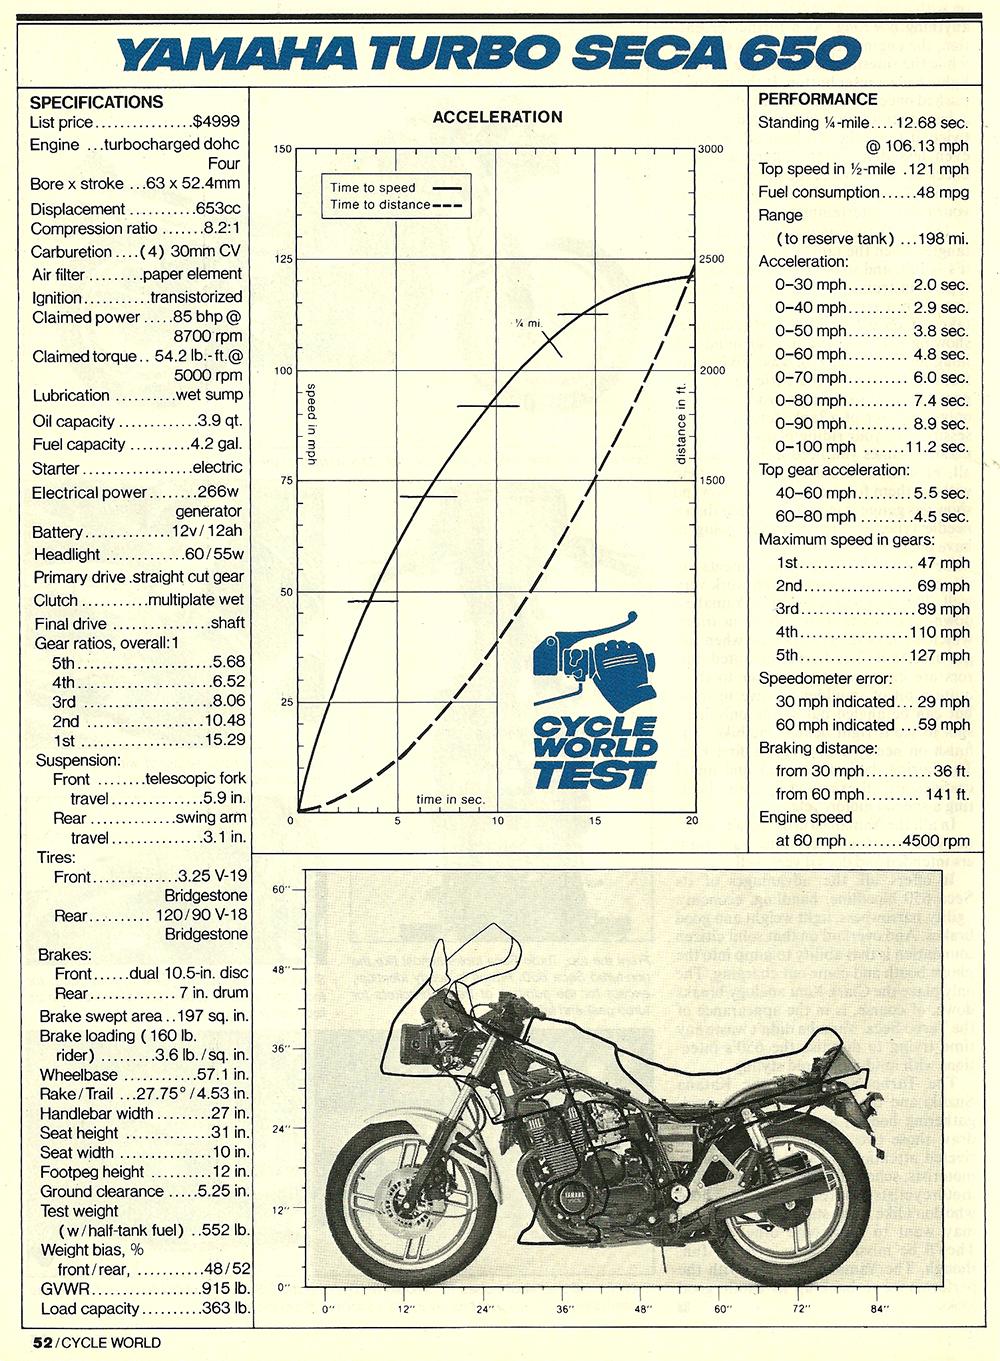 1982 Yamaha Turbo Seca 650 road test 09.jpg